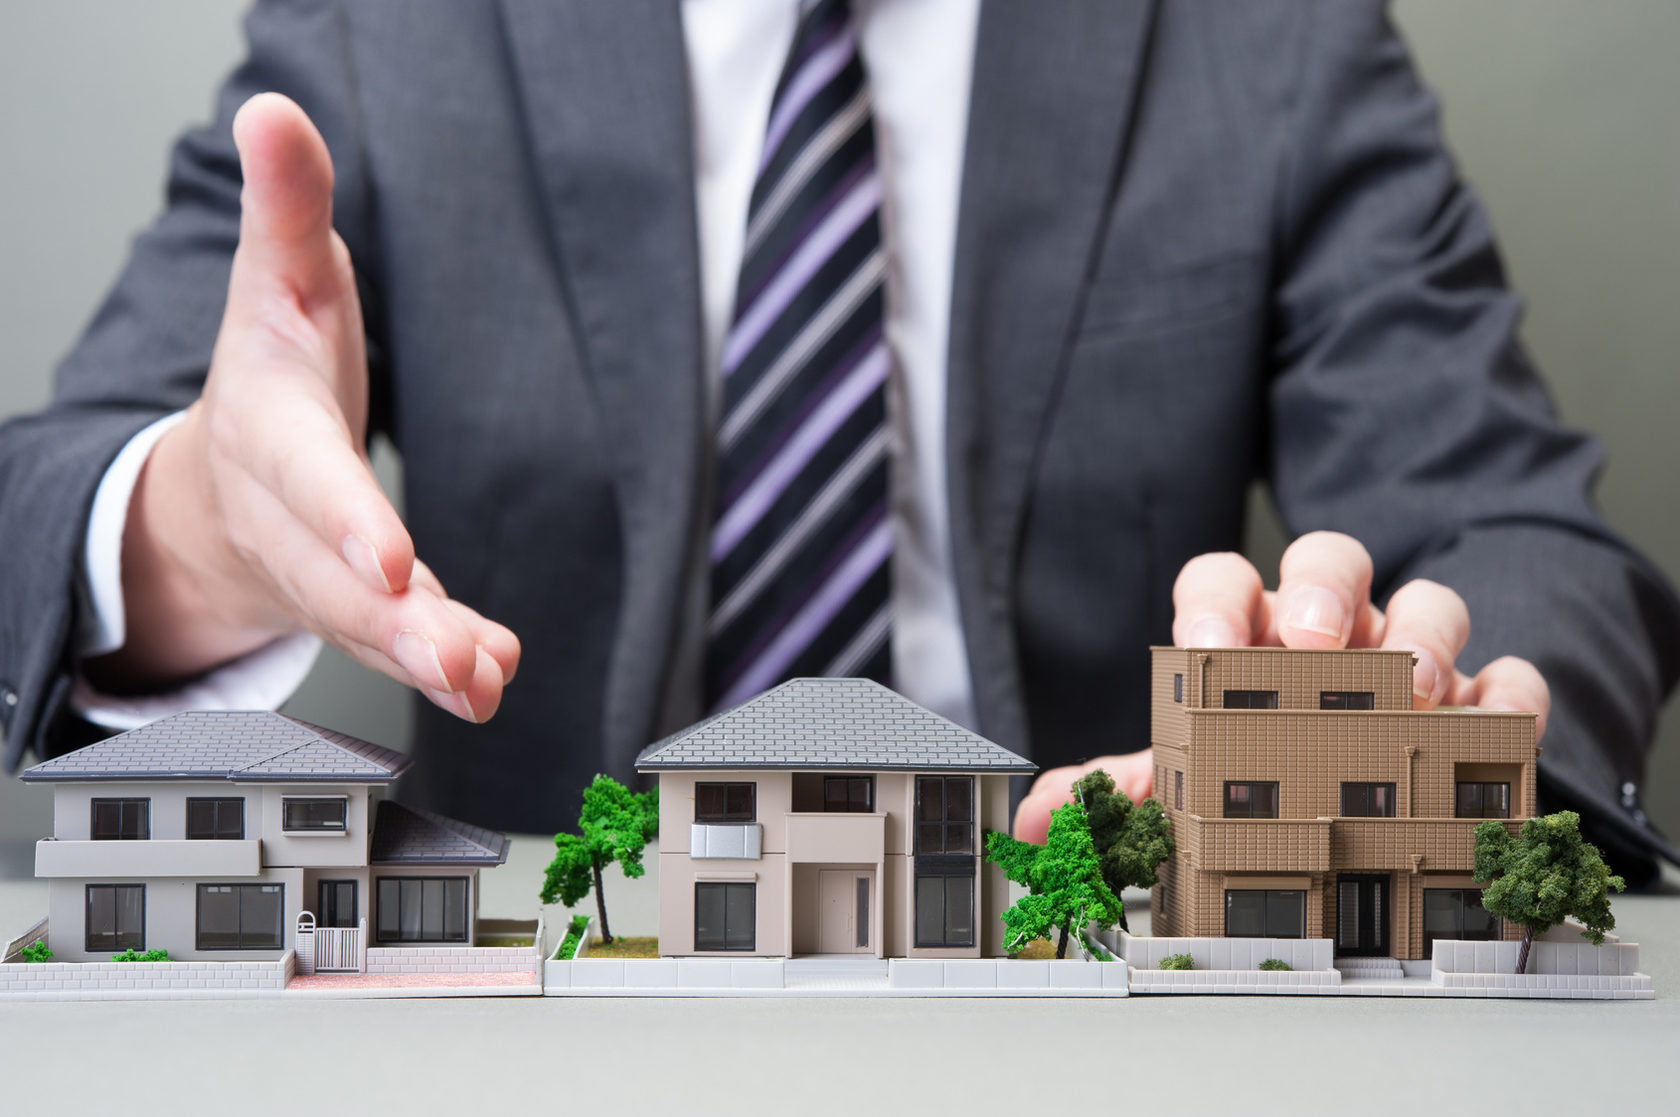 аренда недвижимости у государства